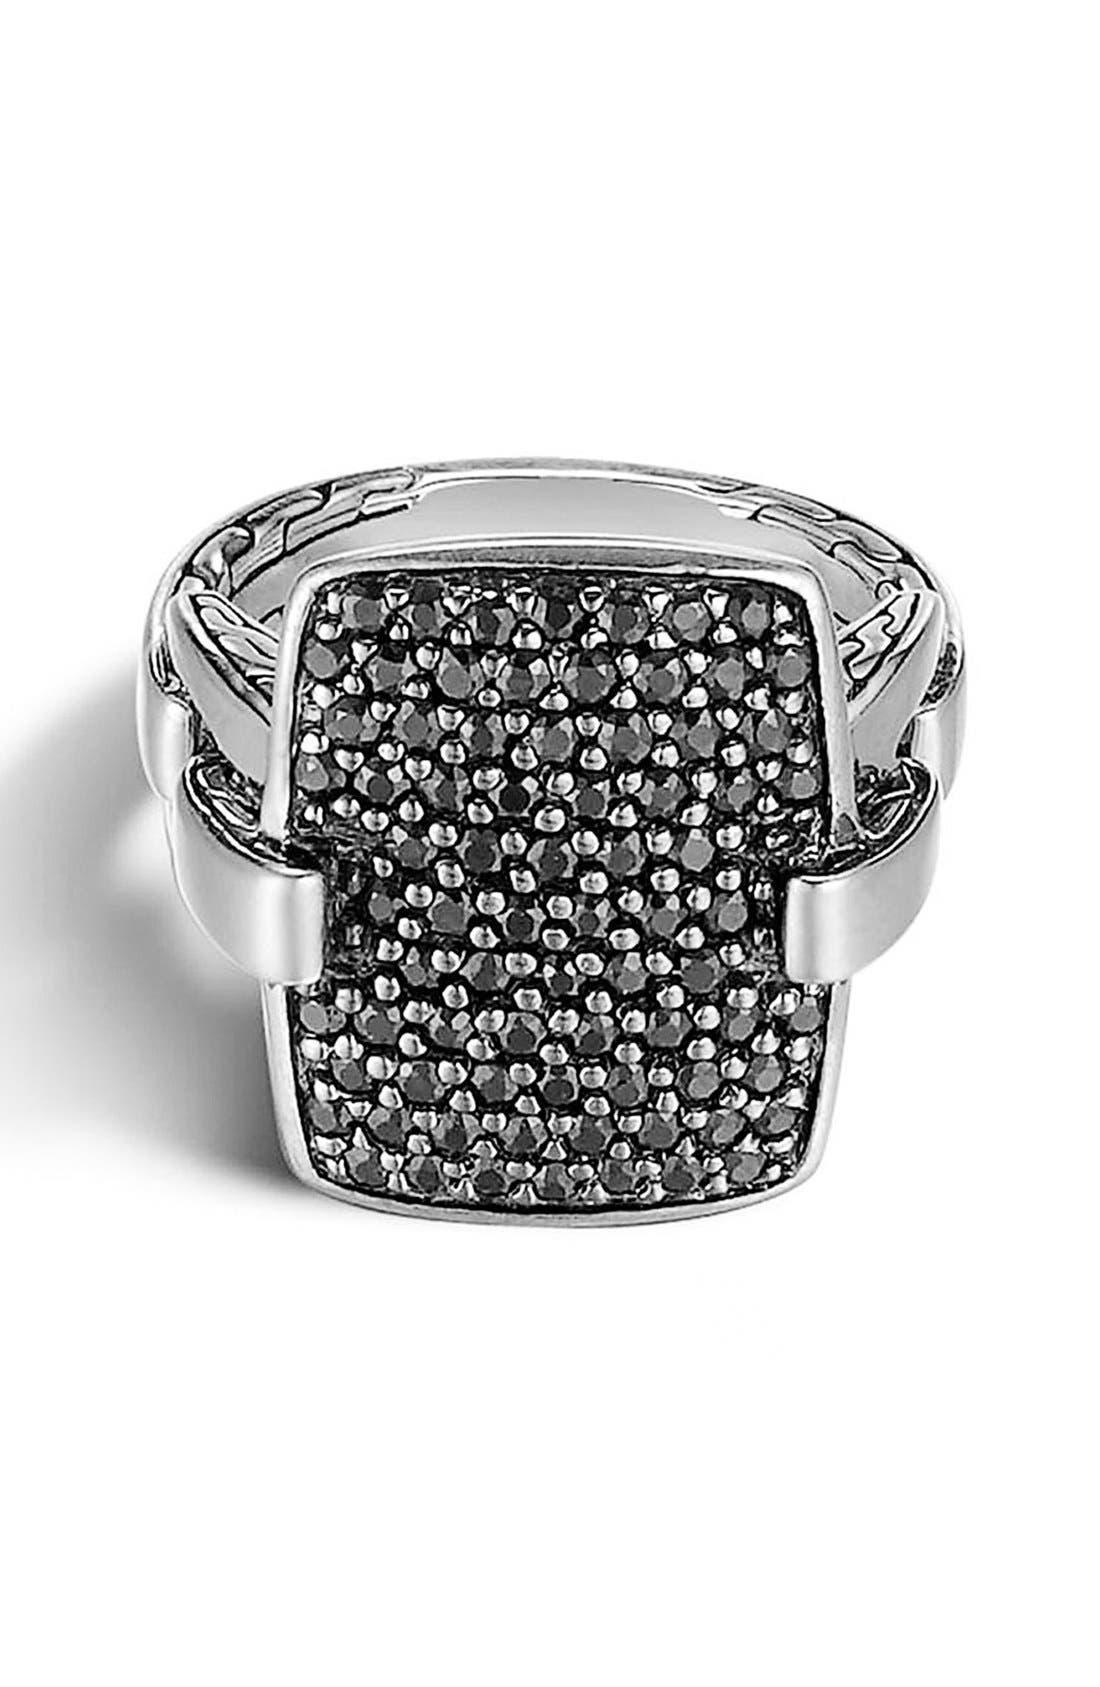 Alternate Image 1 Selected - John Hardy 'Classic Chain' Rectangular Ring